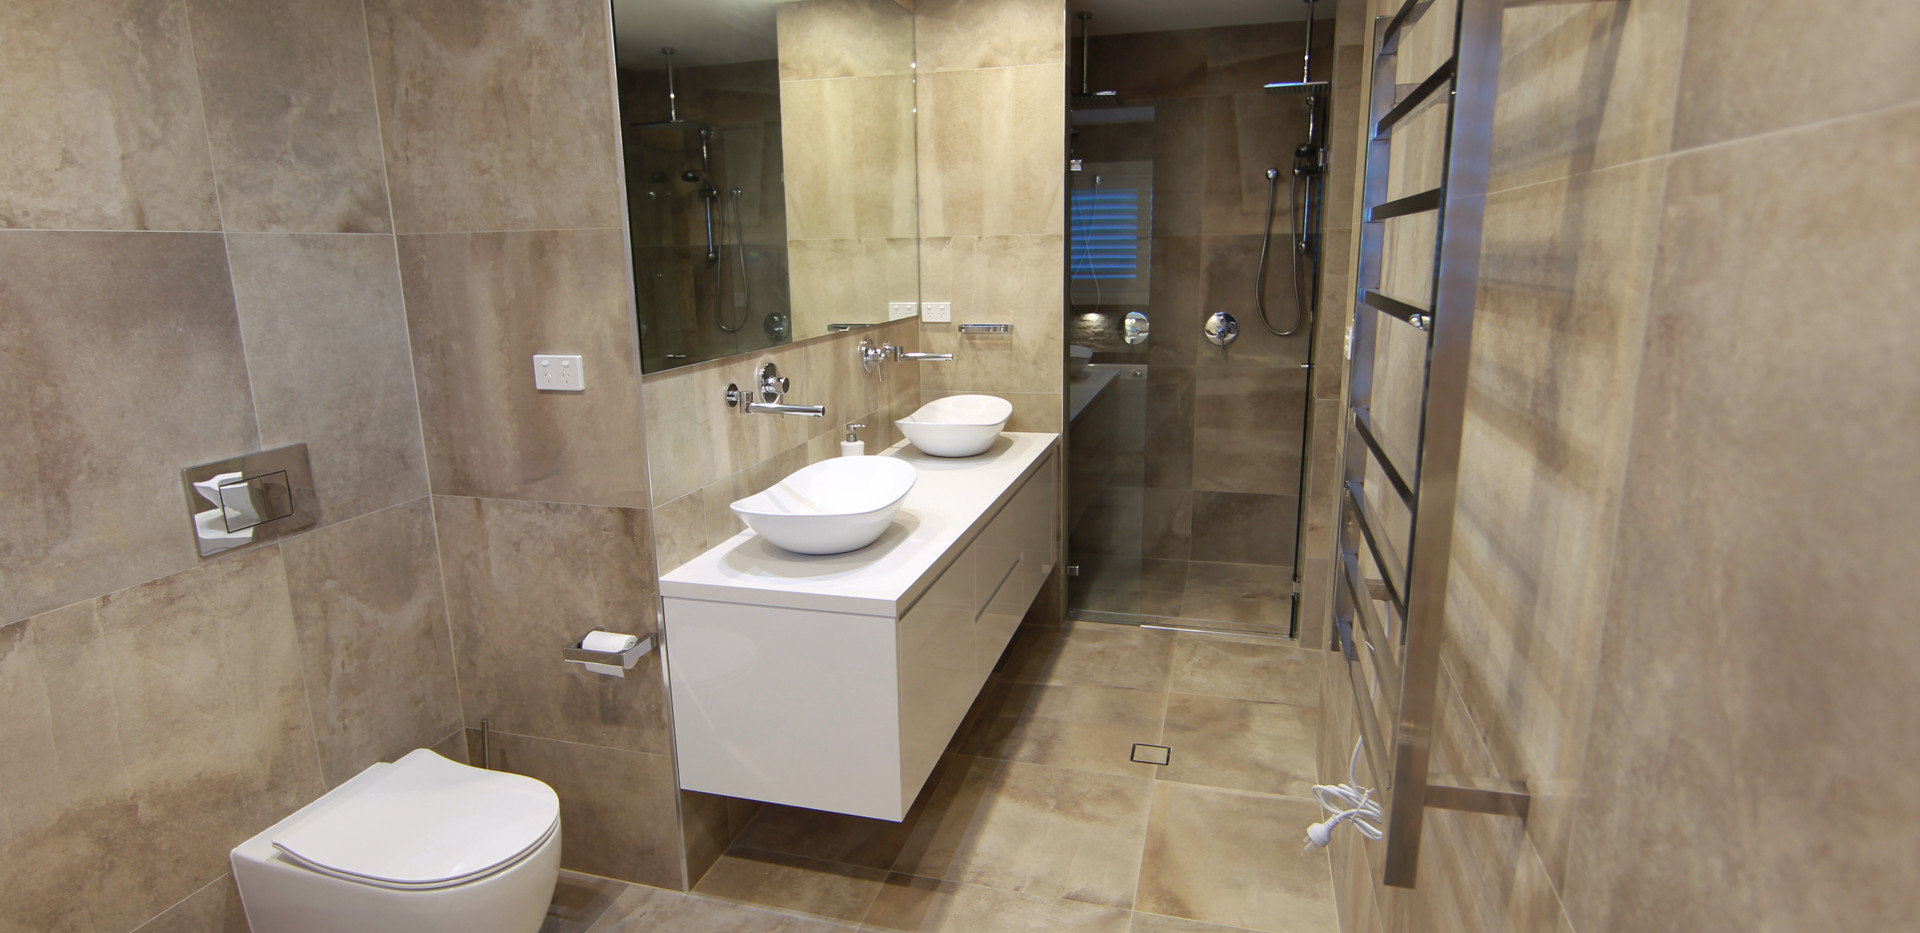 G.F bathroom #1.JPG